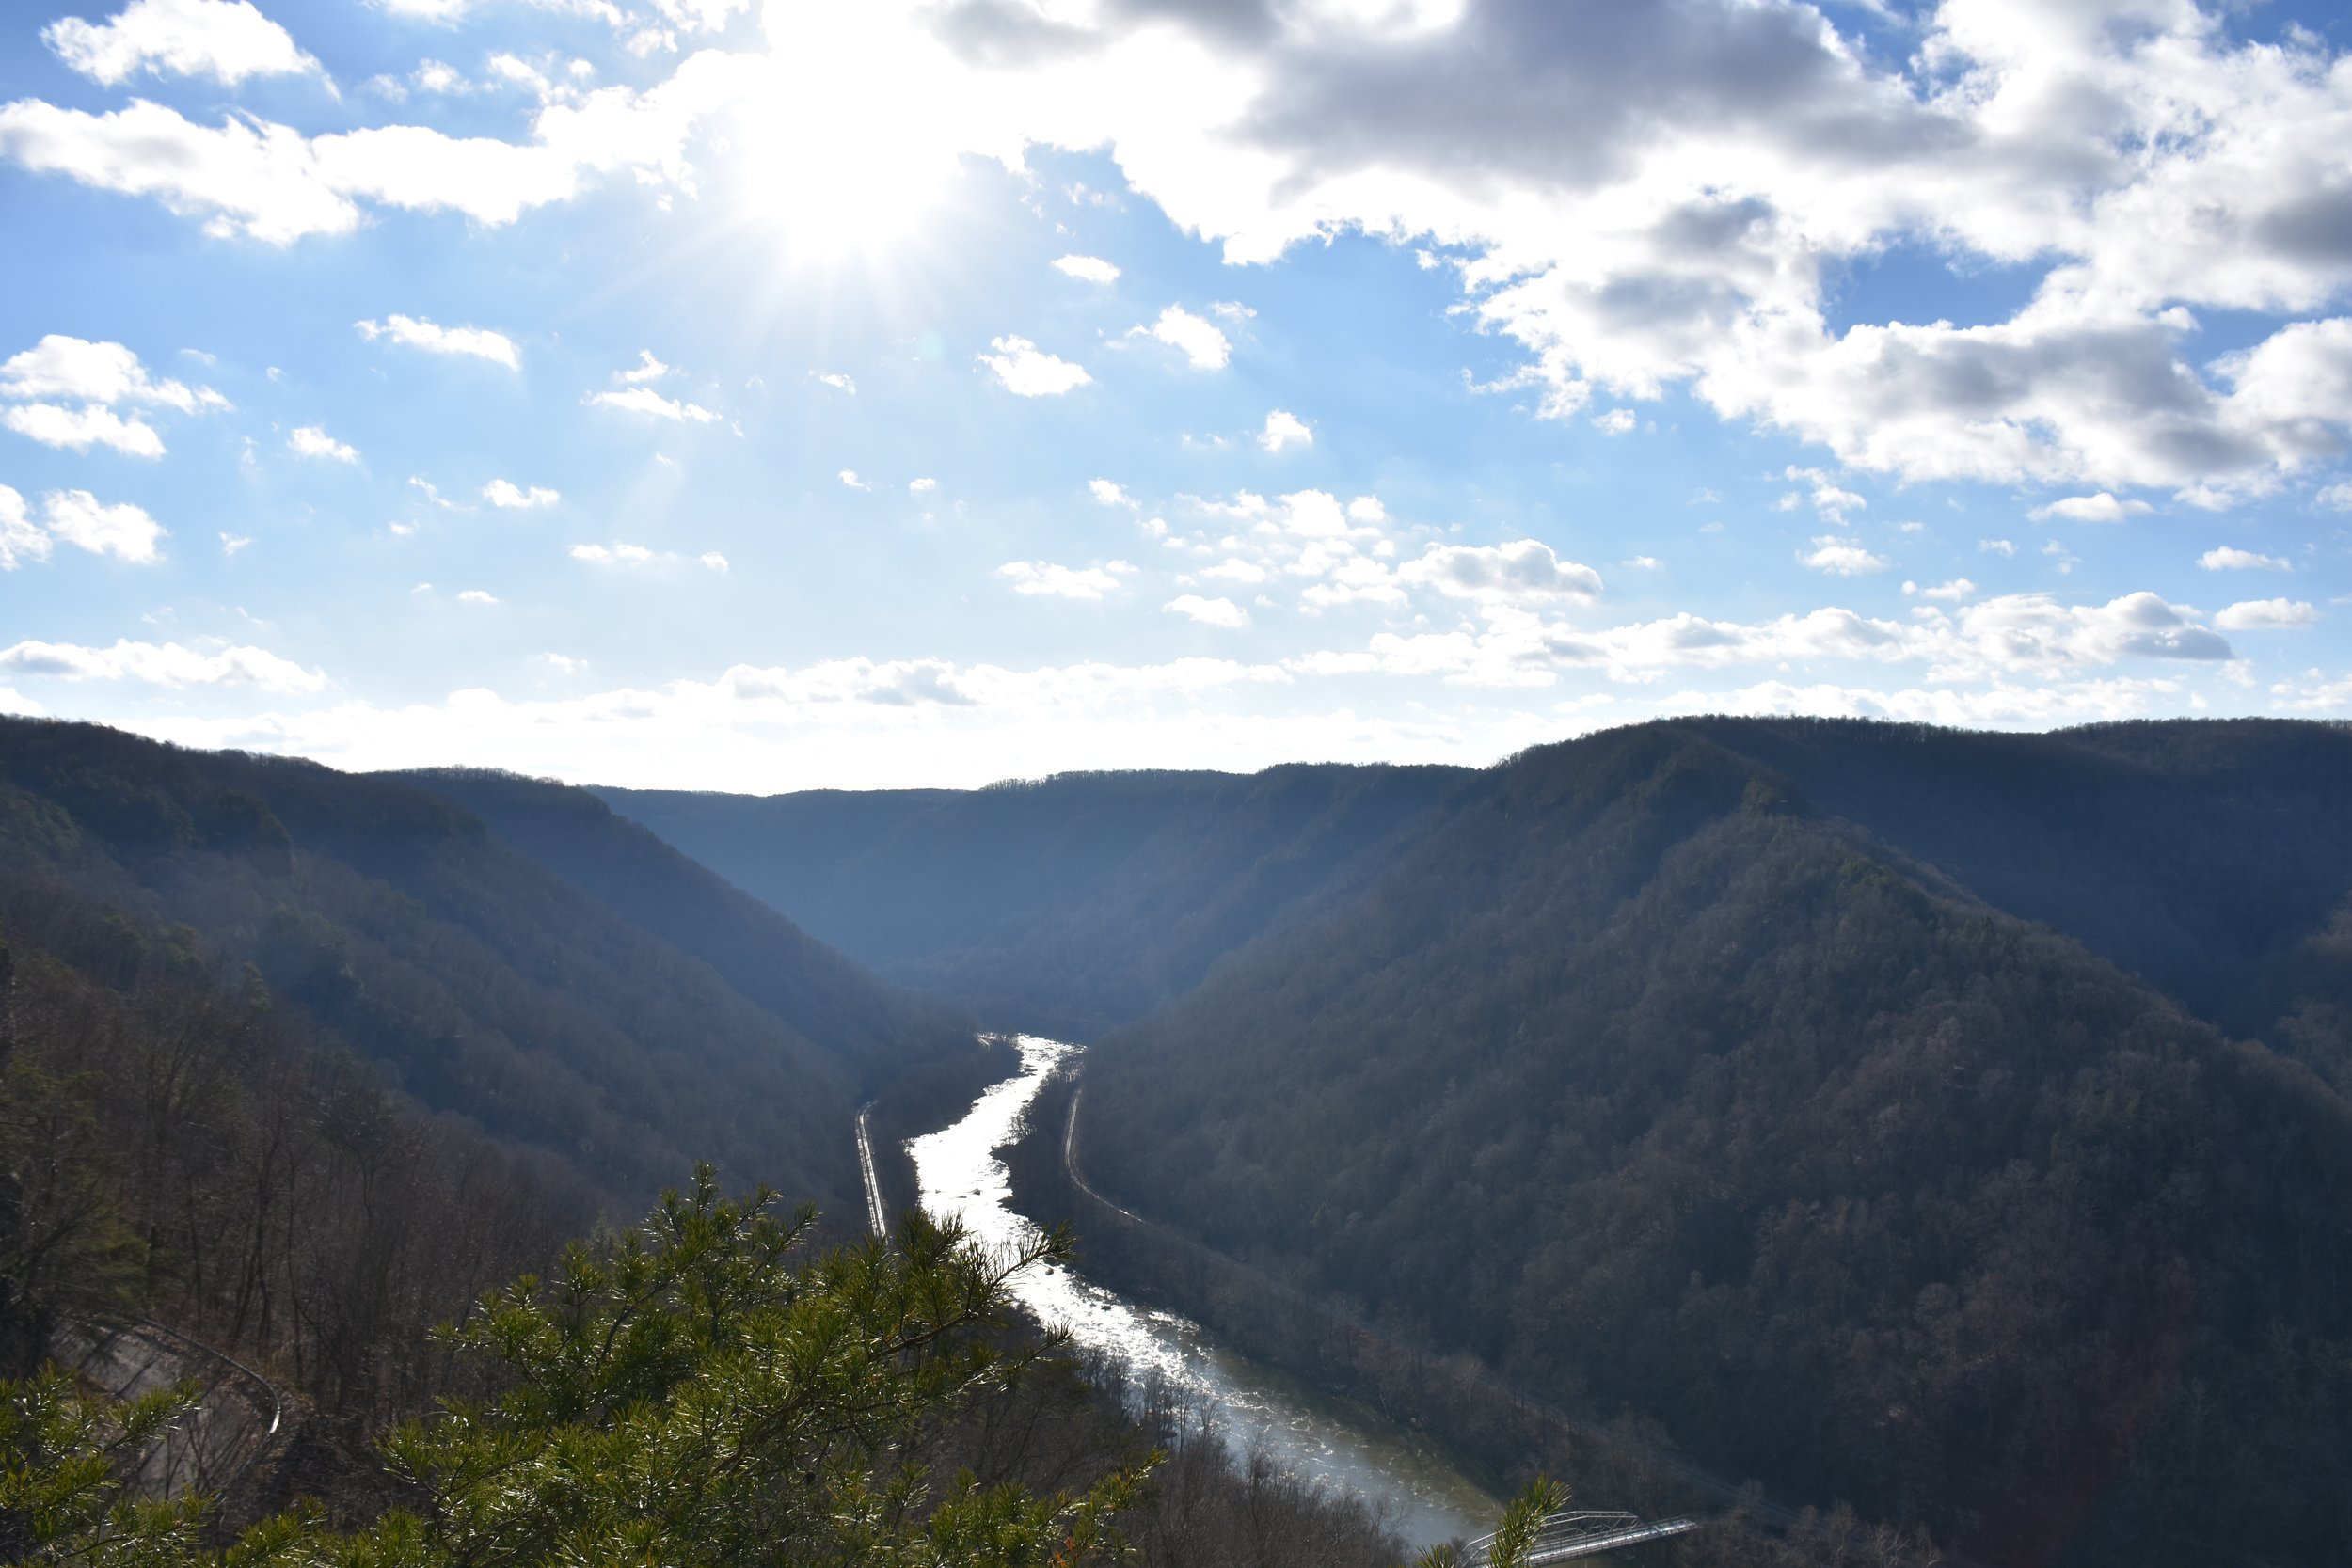 New River, December 2015